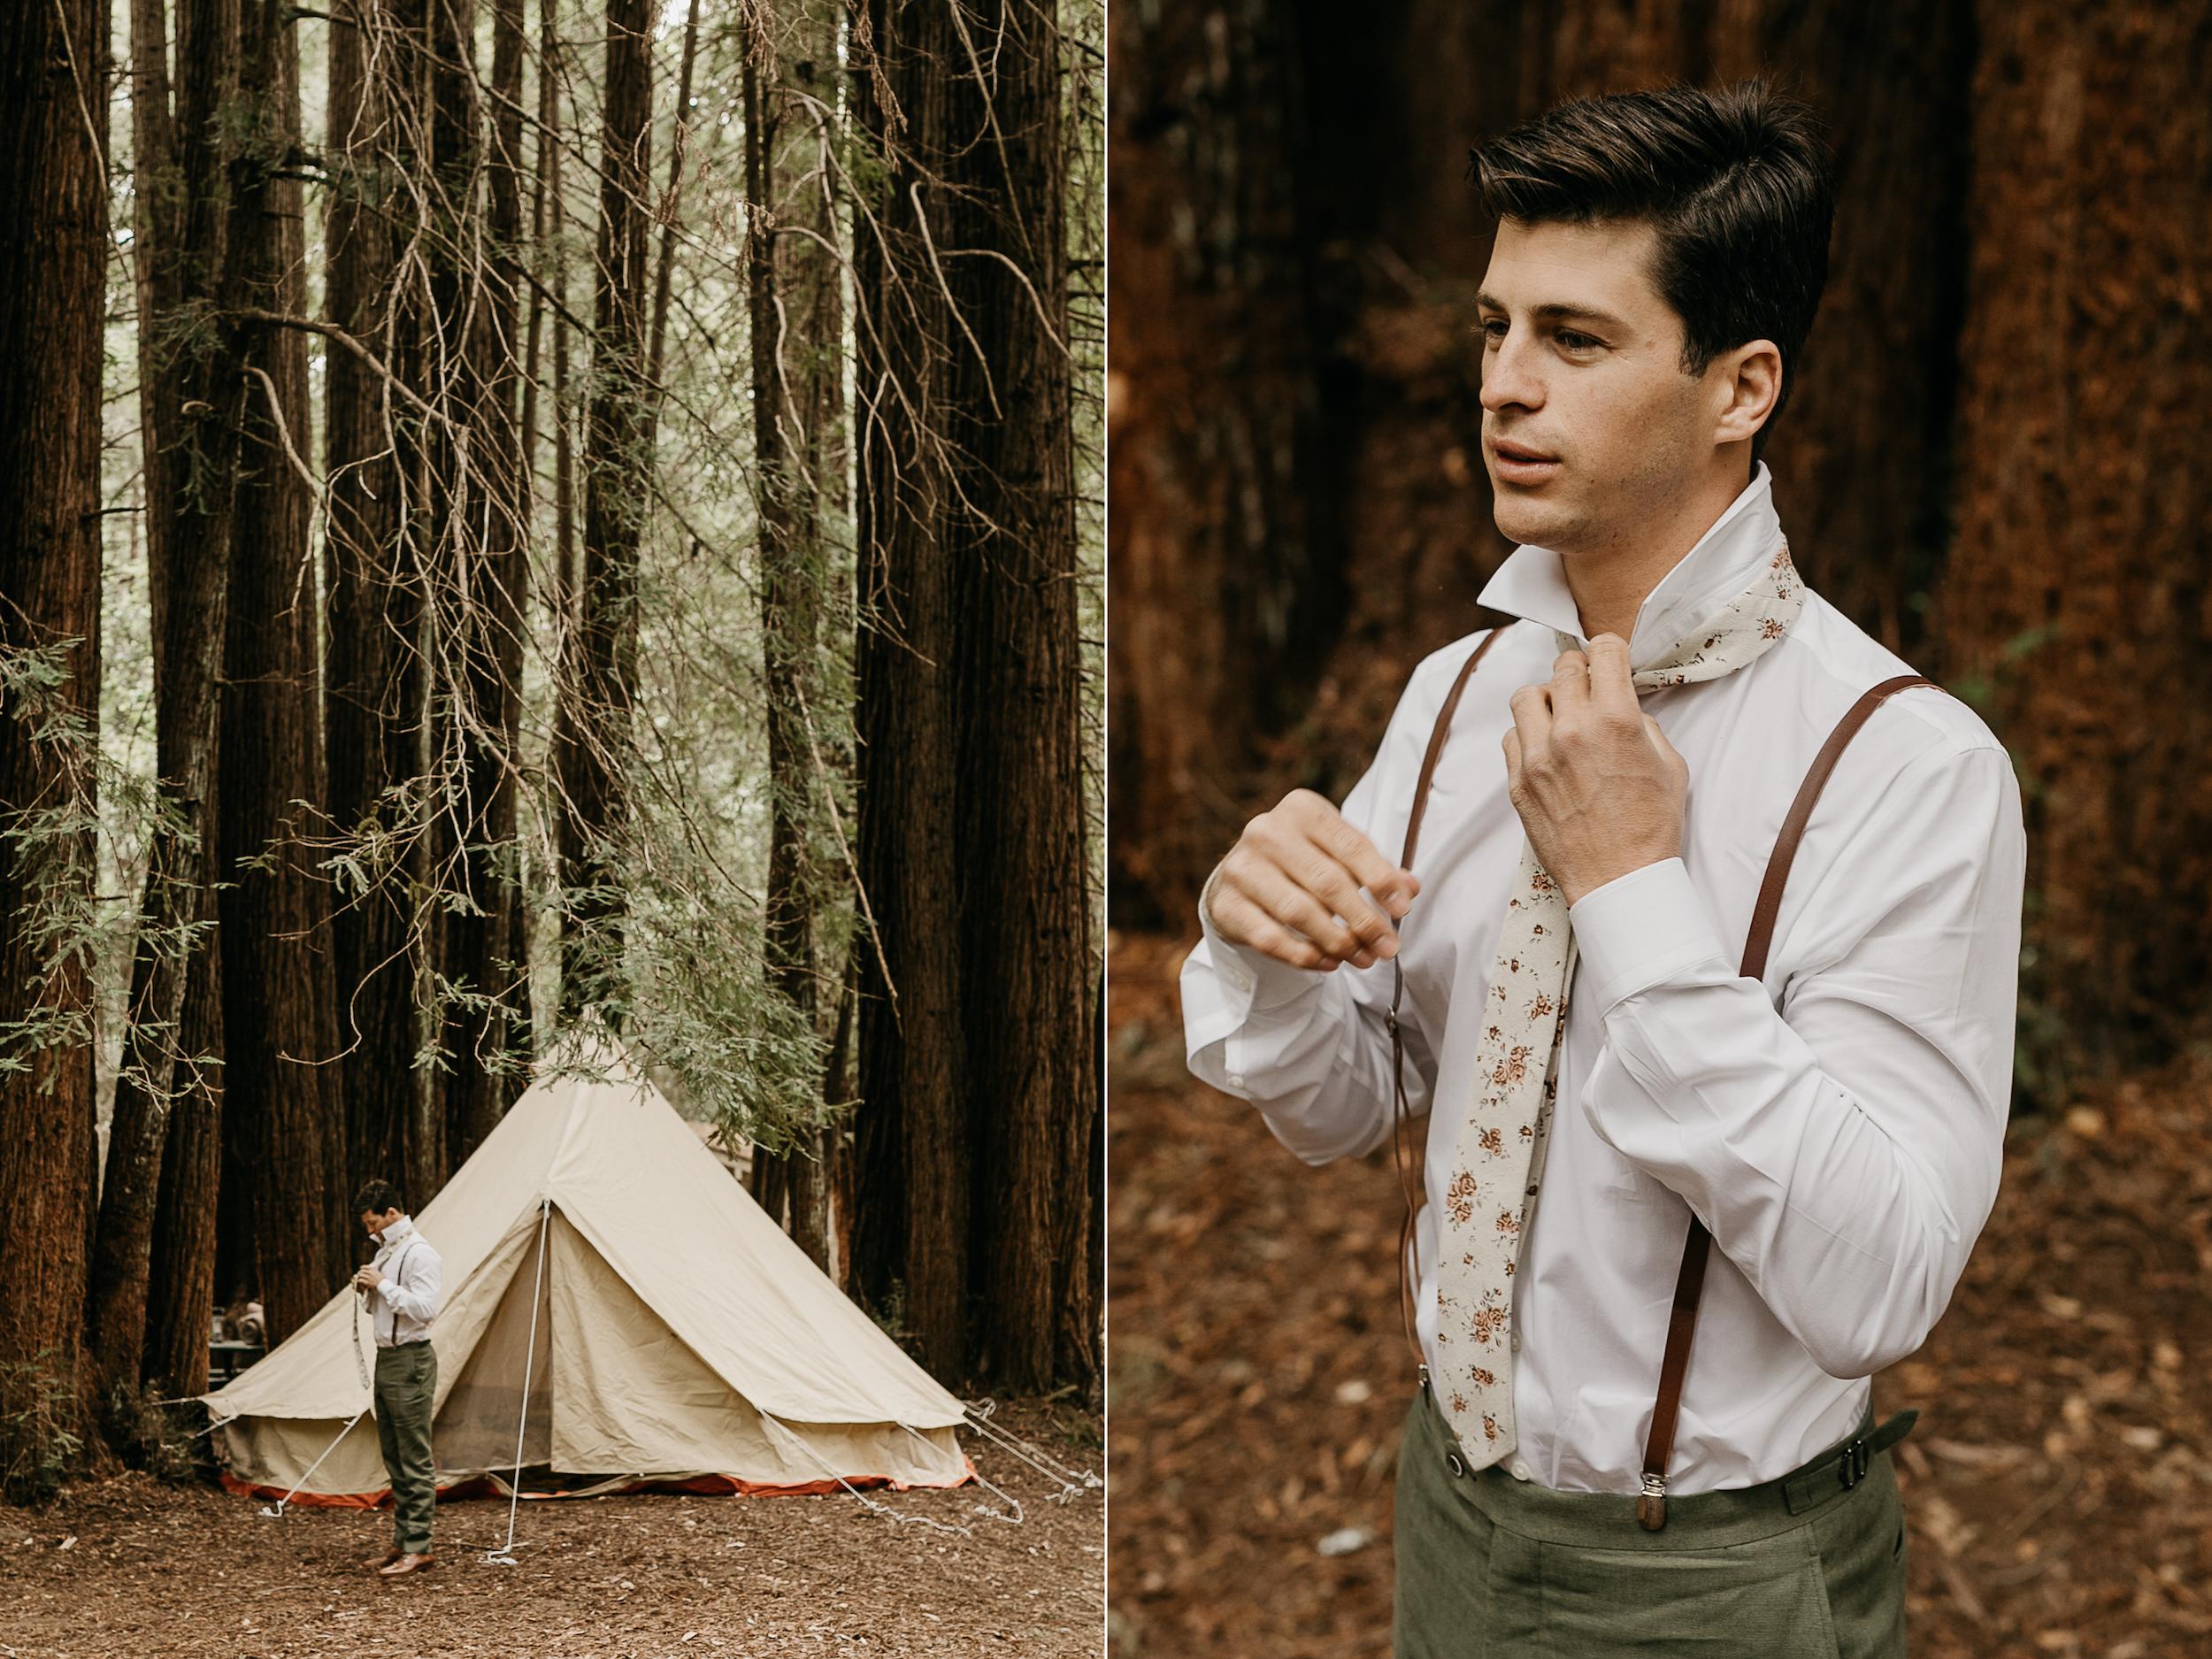 camp campbell-wedding-photographer 01.jpg